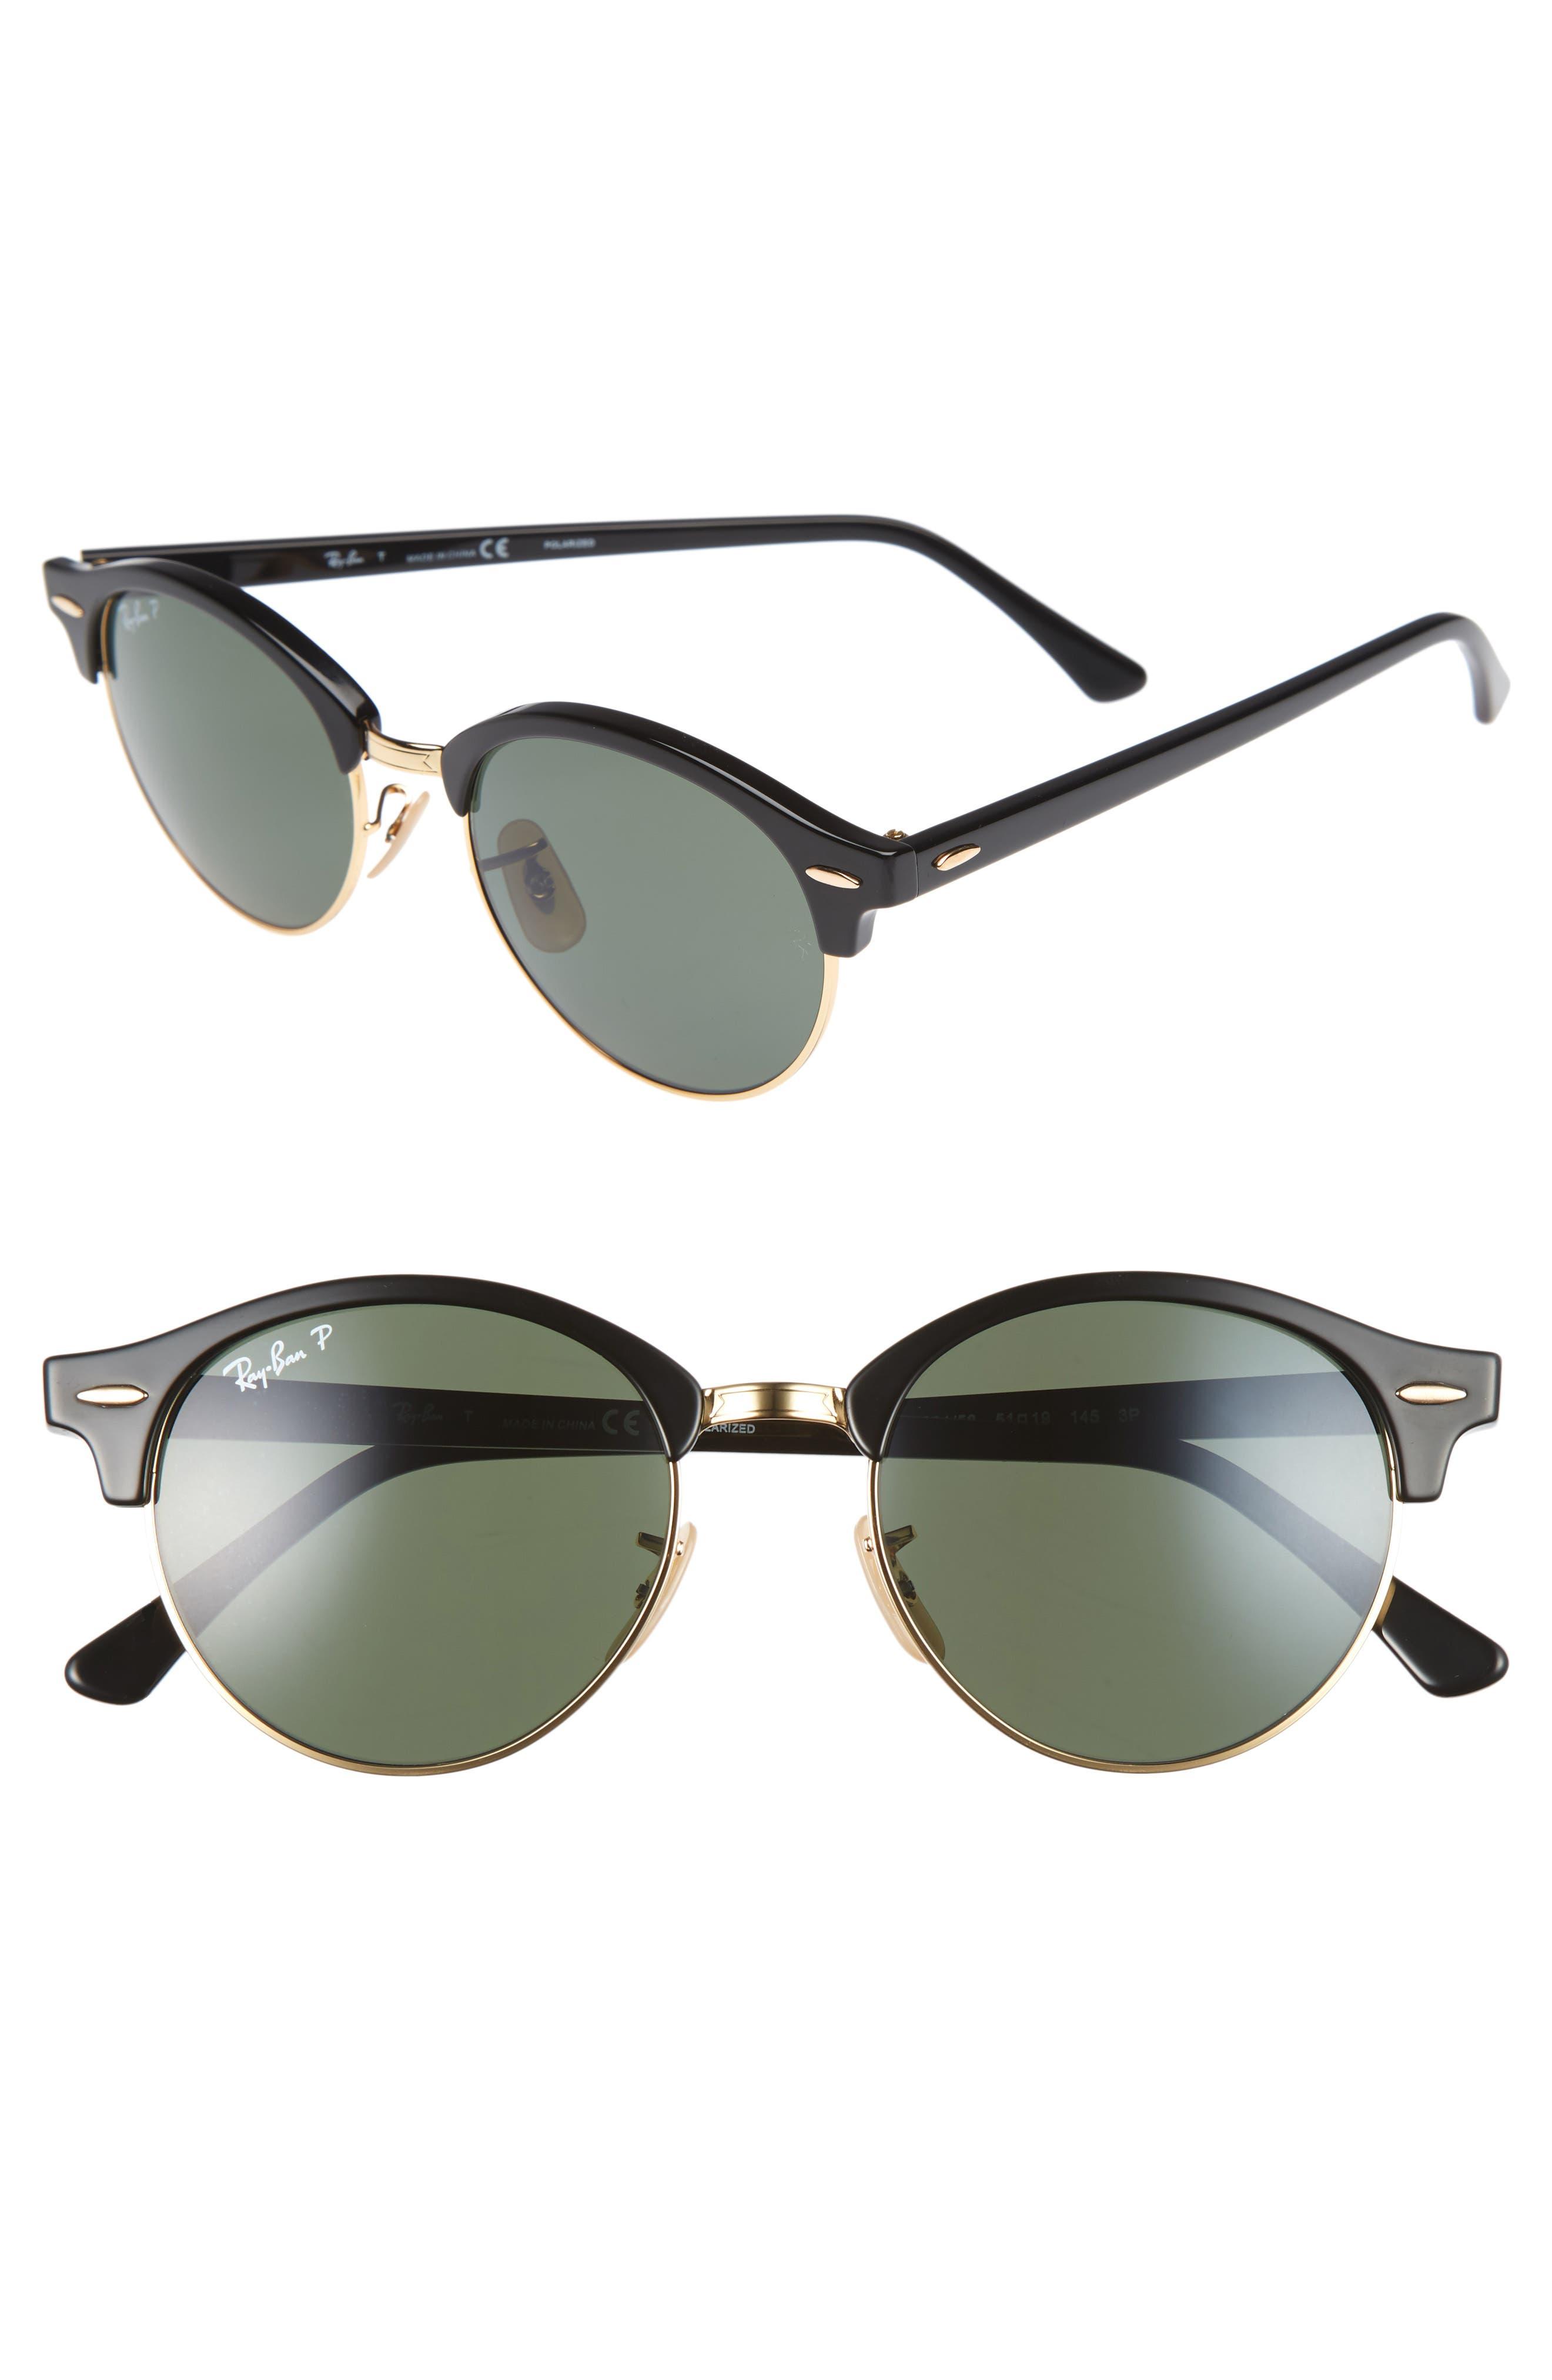 Ray-Ban Clubround 51Mm Polarized Sunglasses -